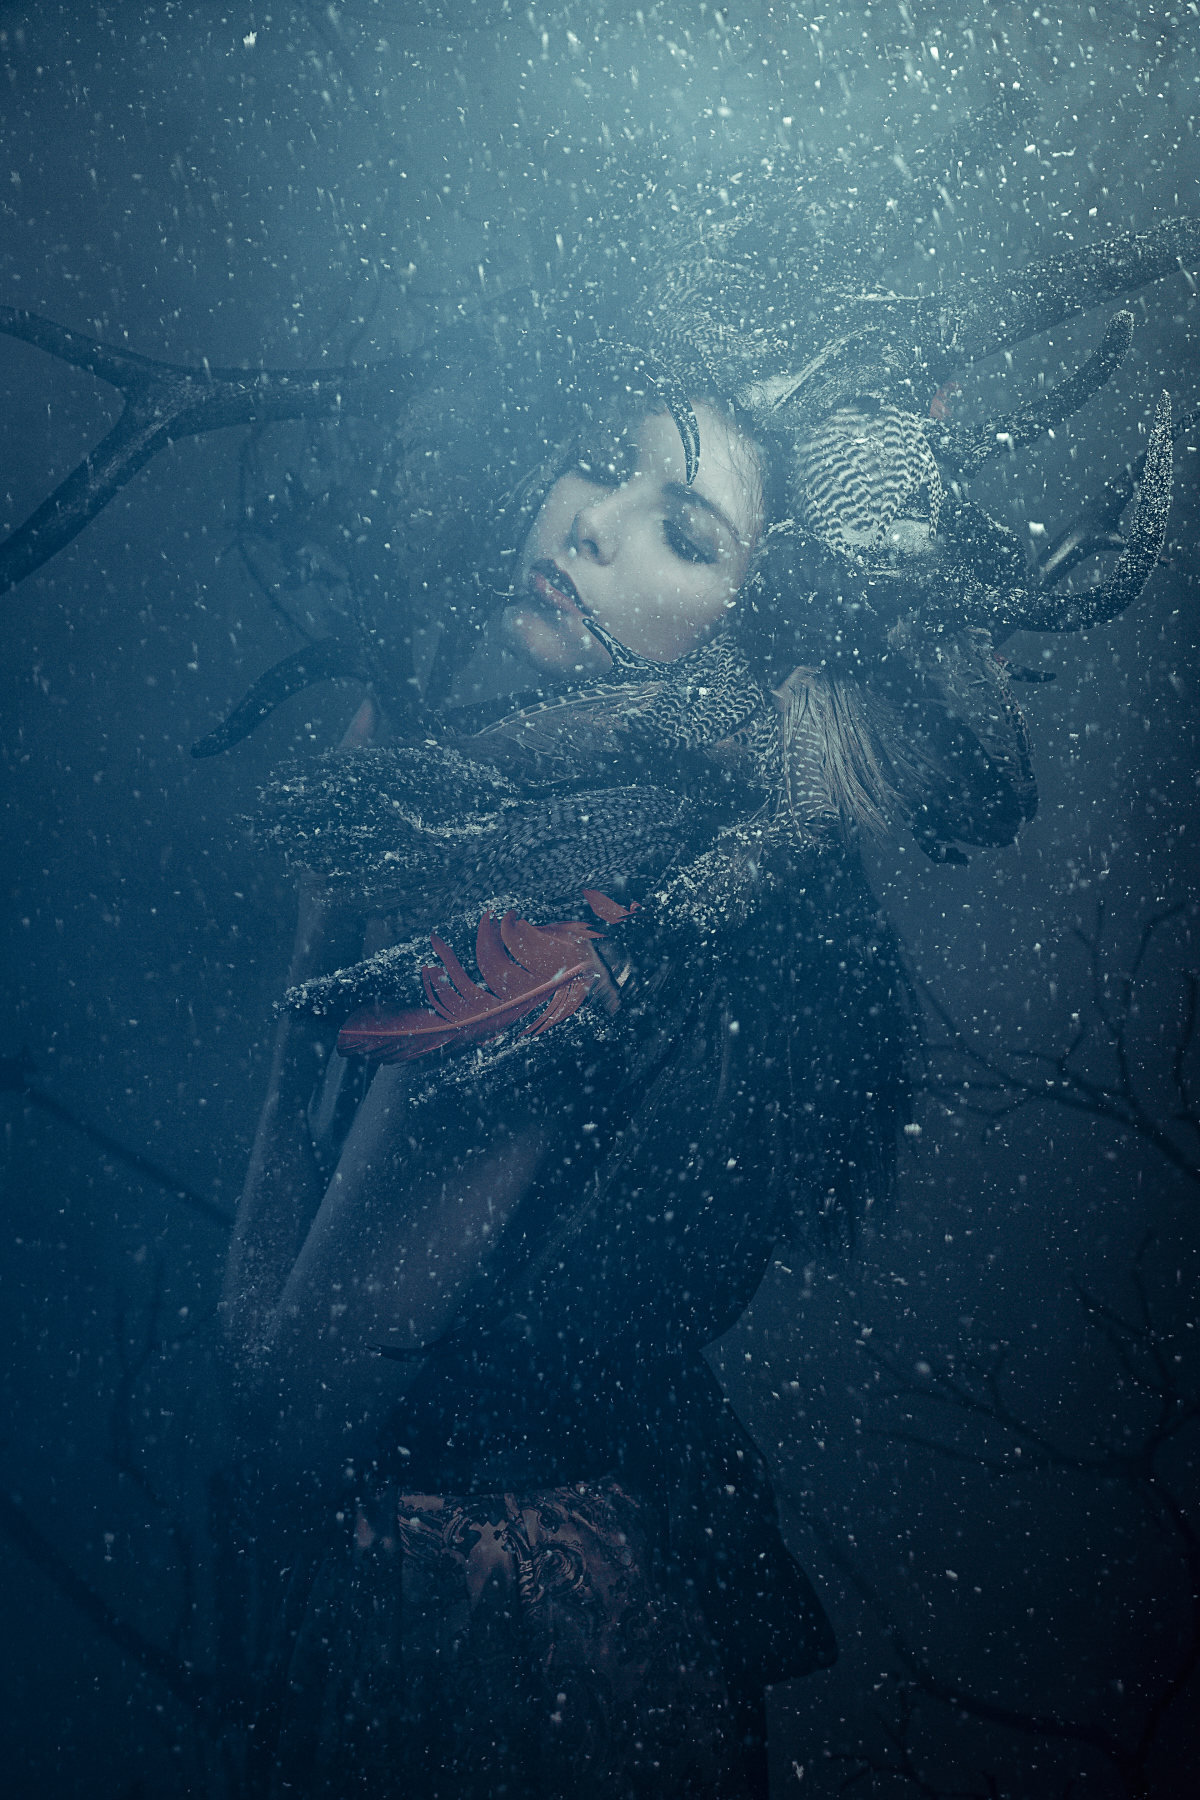 Martin Strauss - Francesca Fiore - mask Posh Fairytale Couture - ast Andrea Fleckenstein